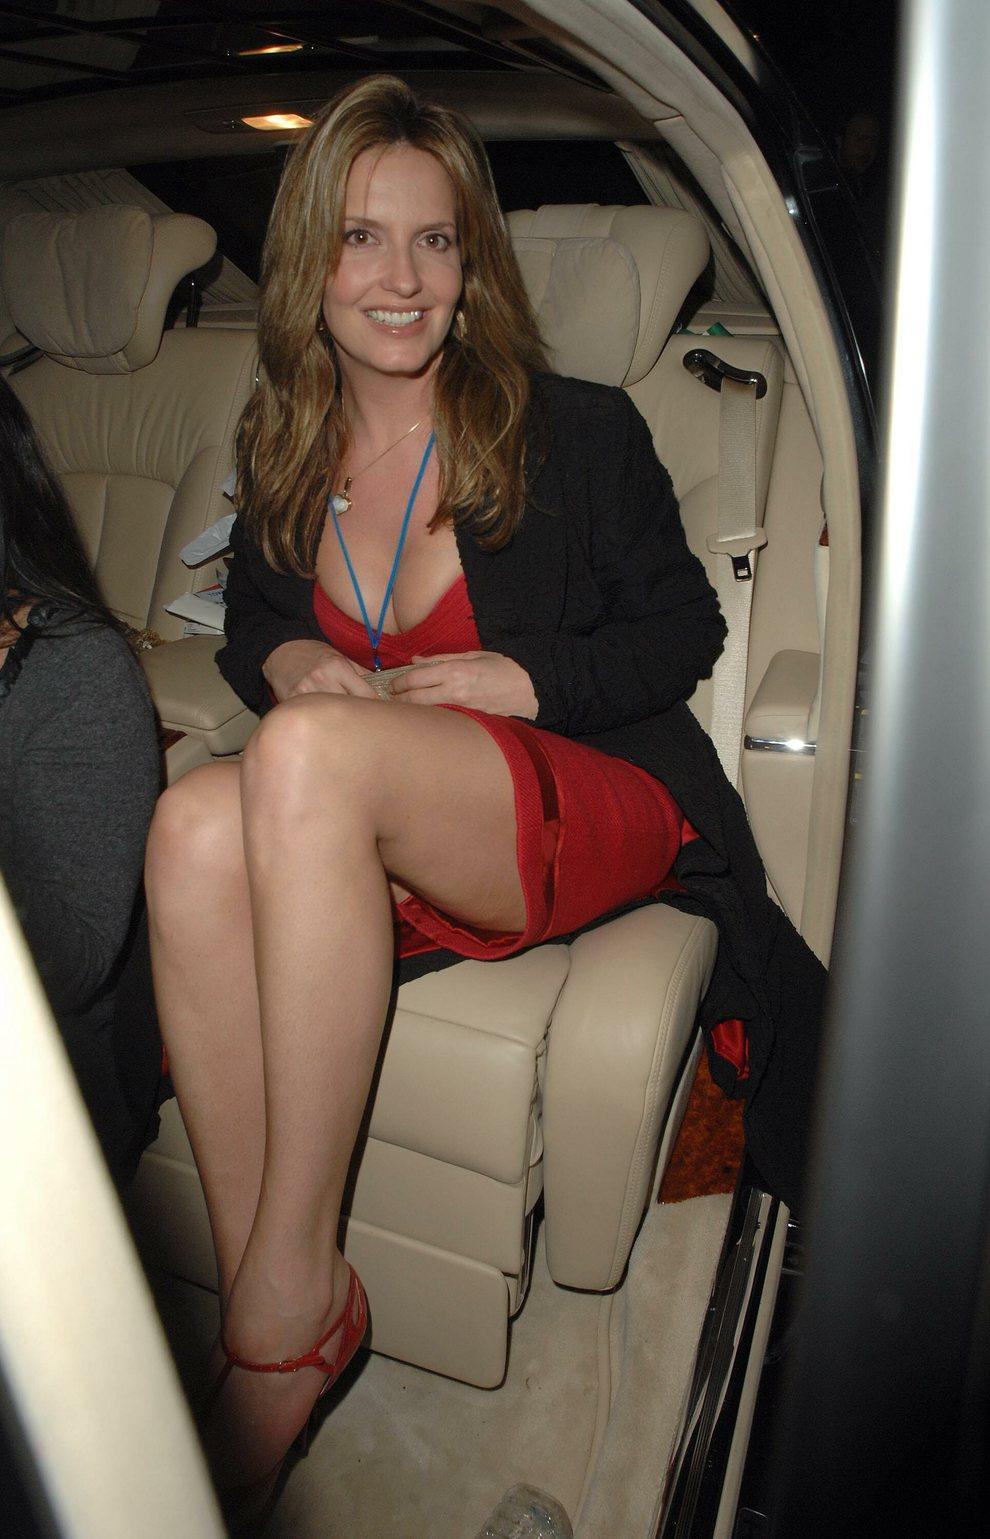 Номера проституток чебоксарах фото 643-591